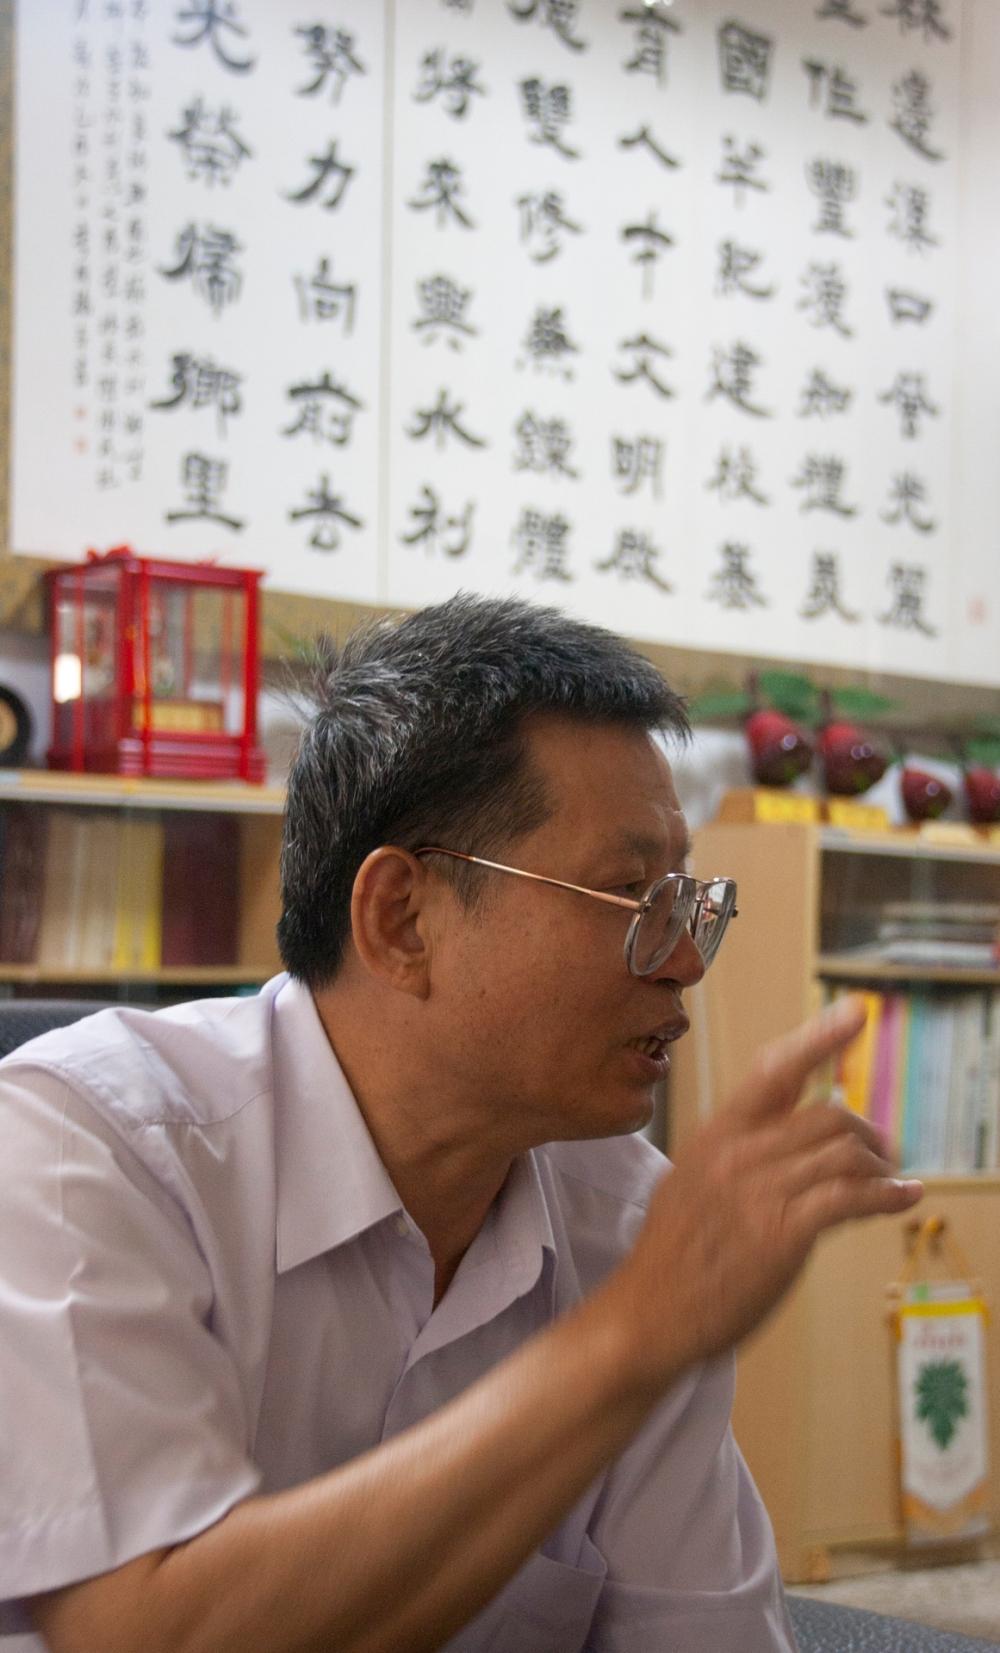 Shuili Elementary School Principal